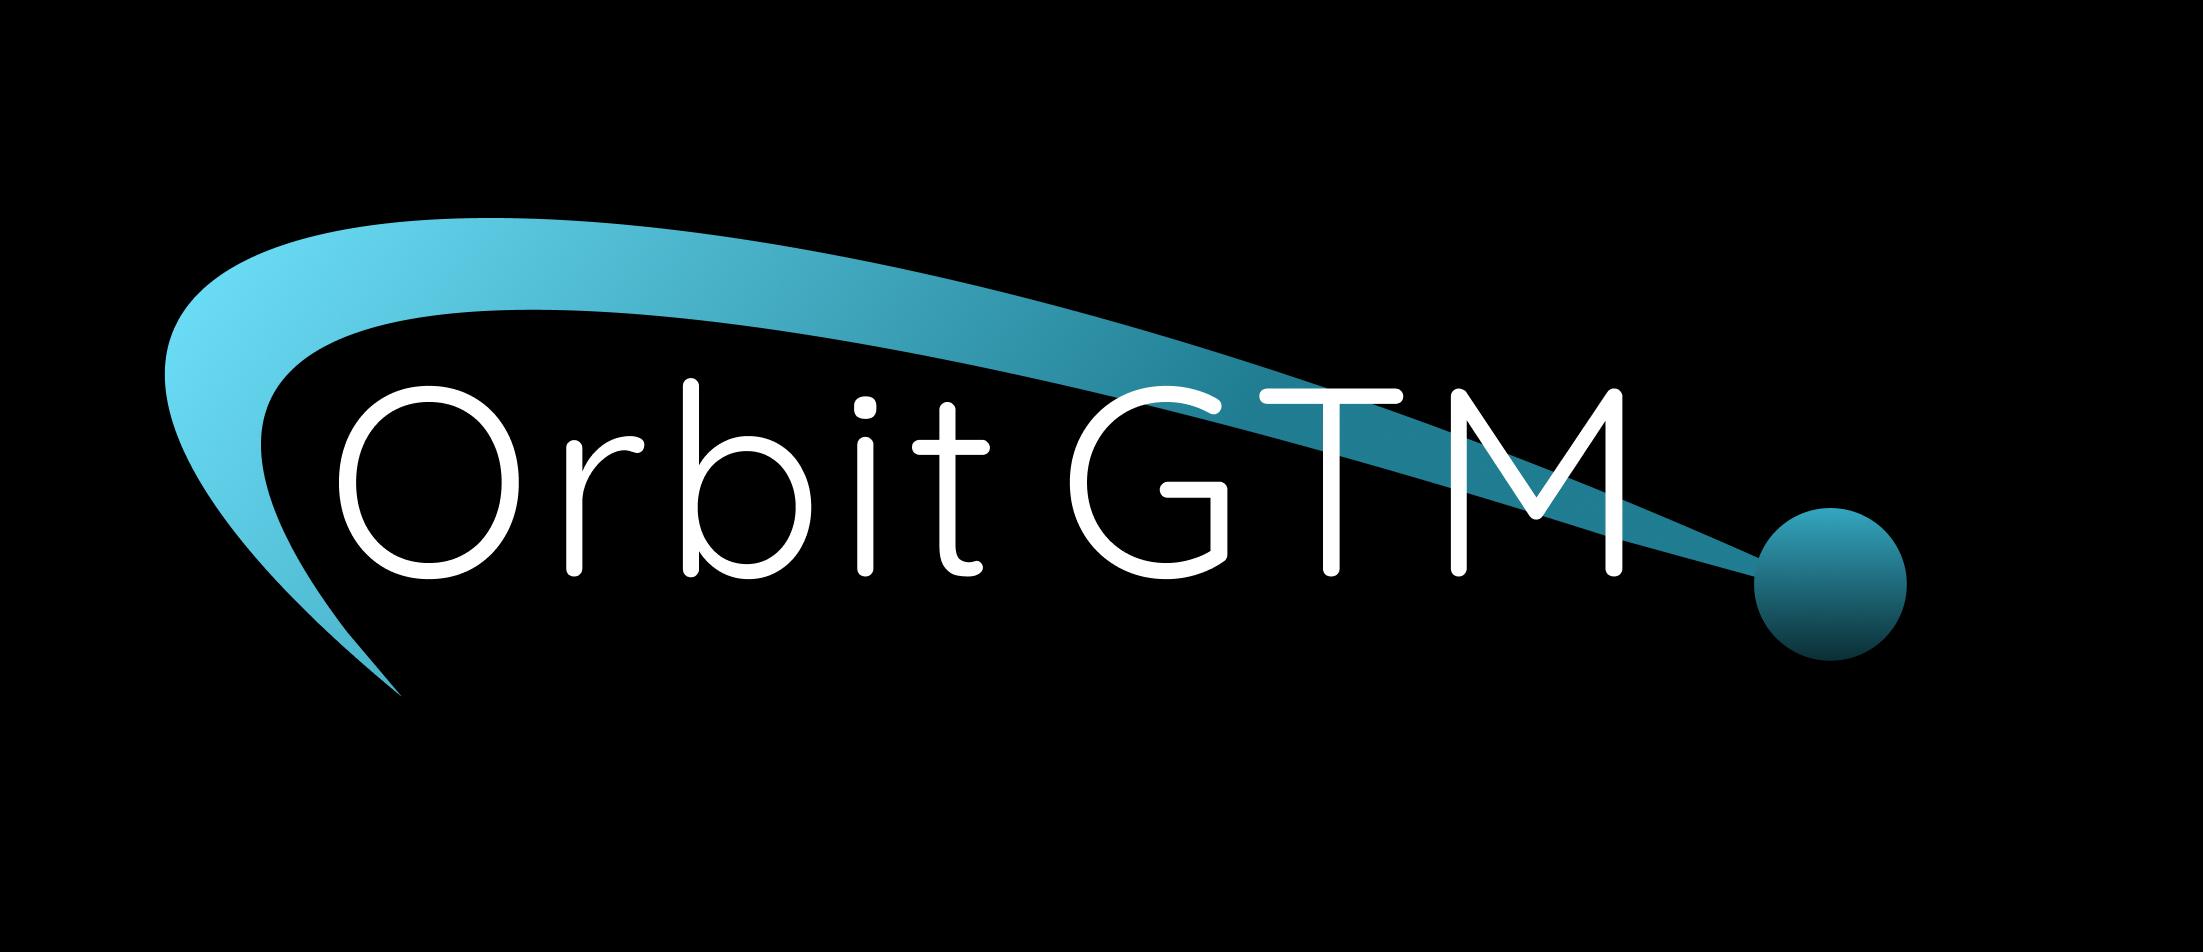 OrbitGTM logo